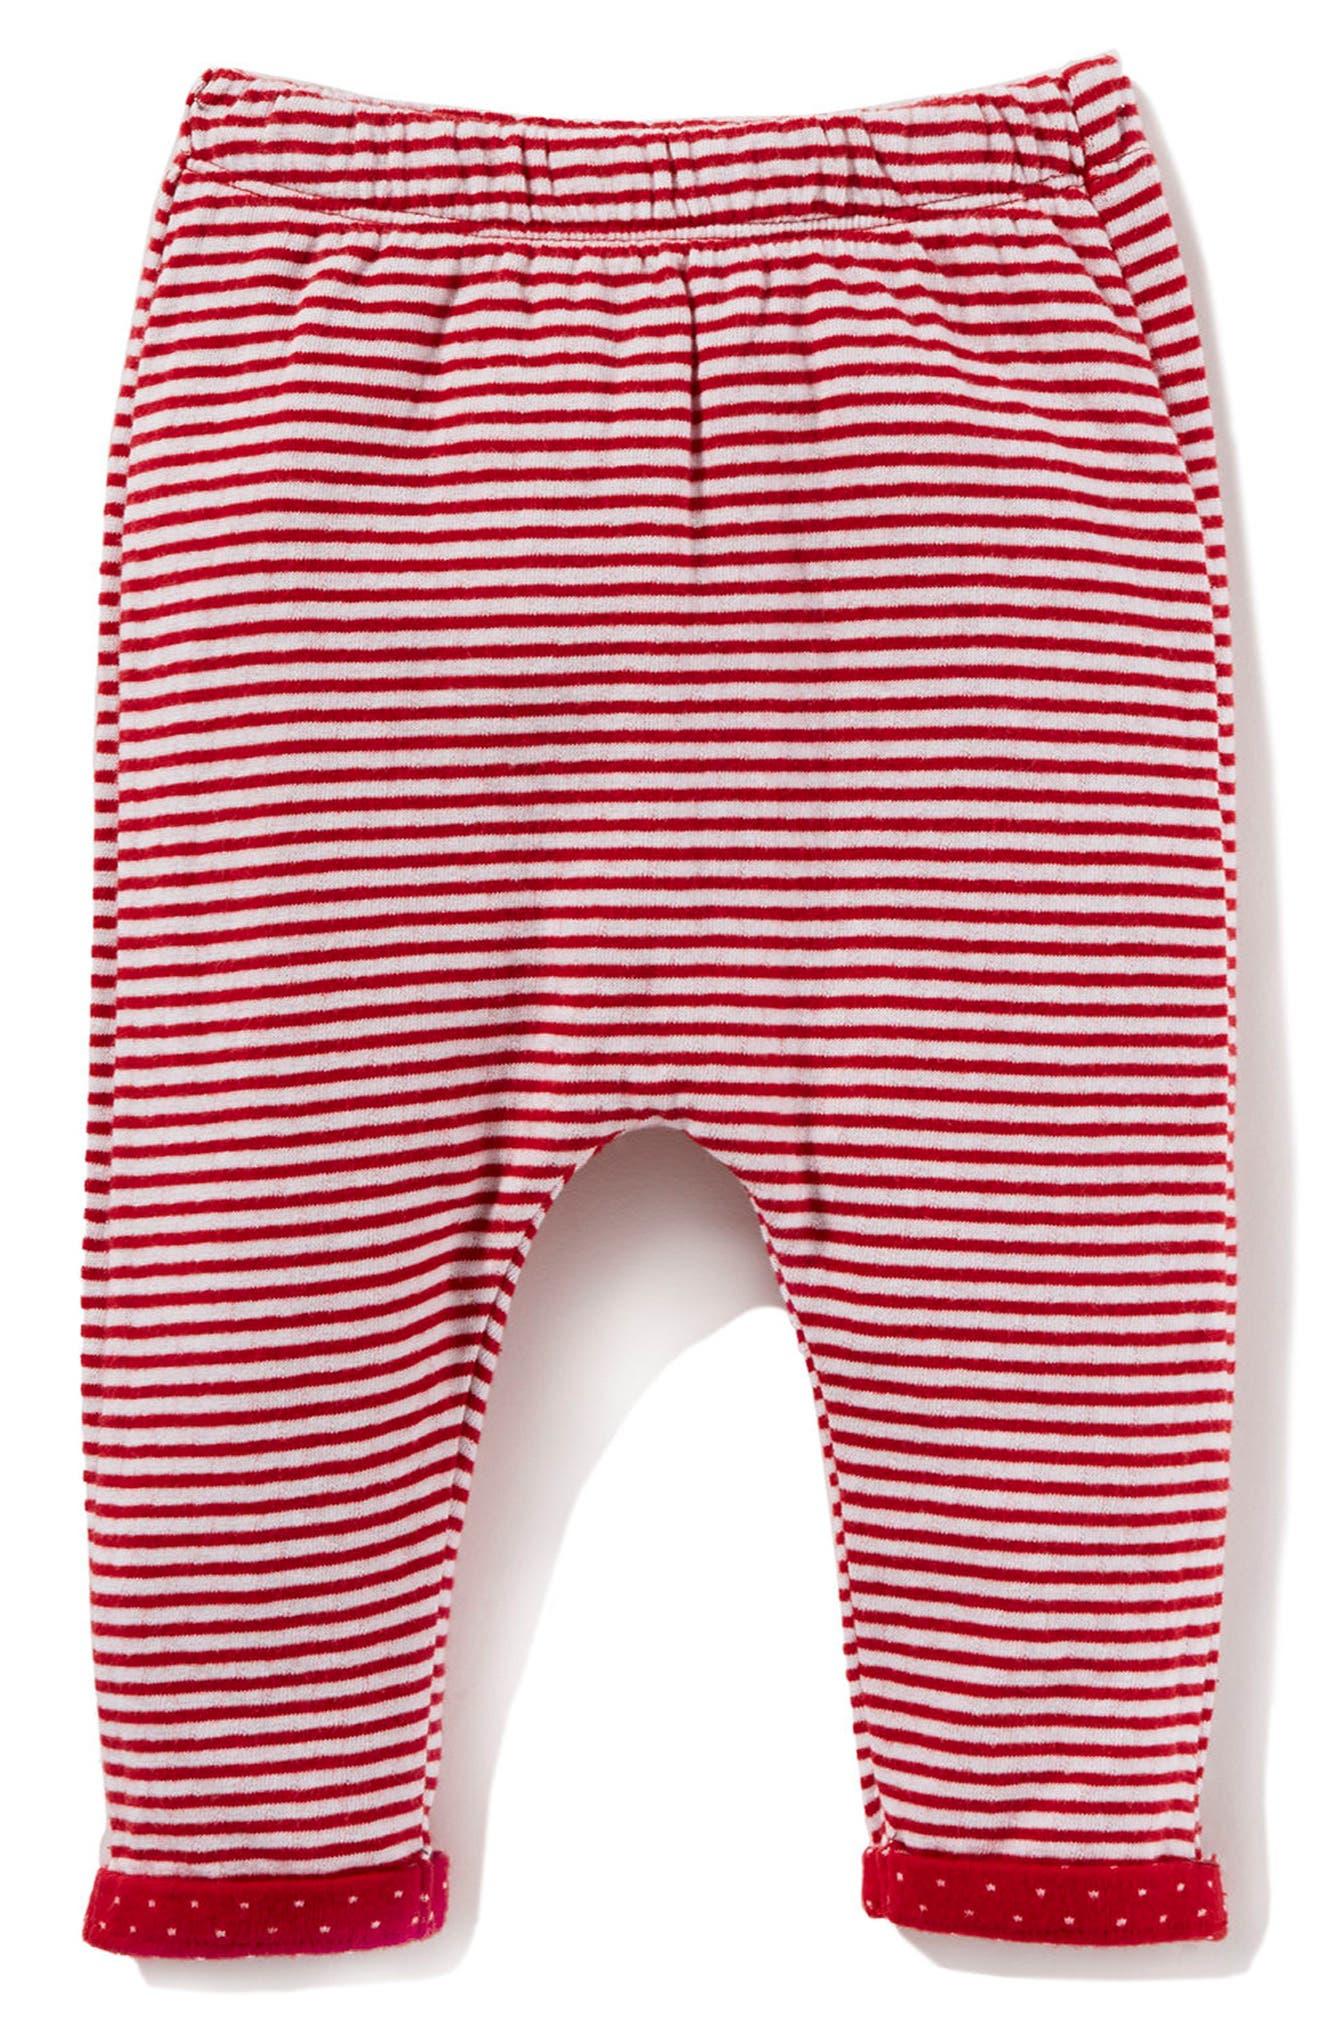 Peek Marley Pants,                         Main,                         color,